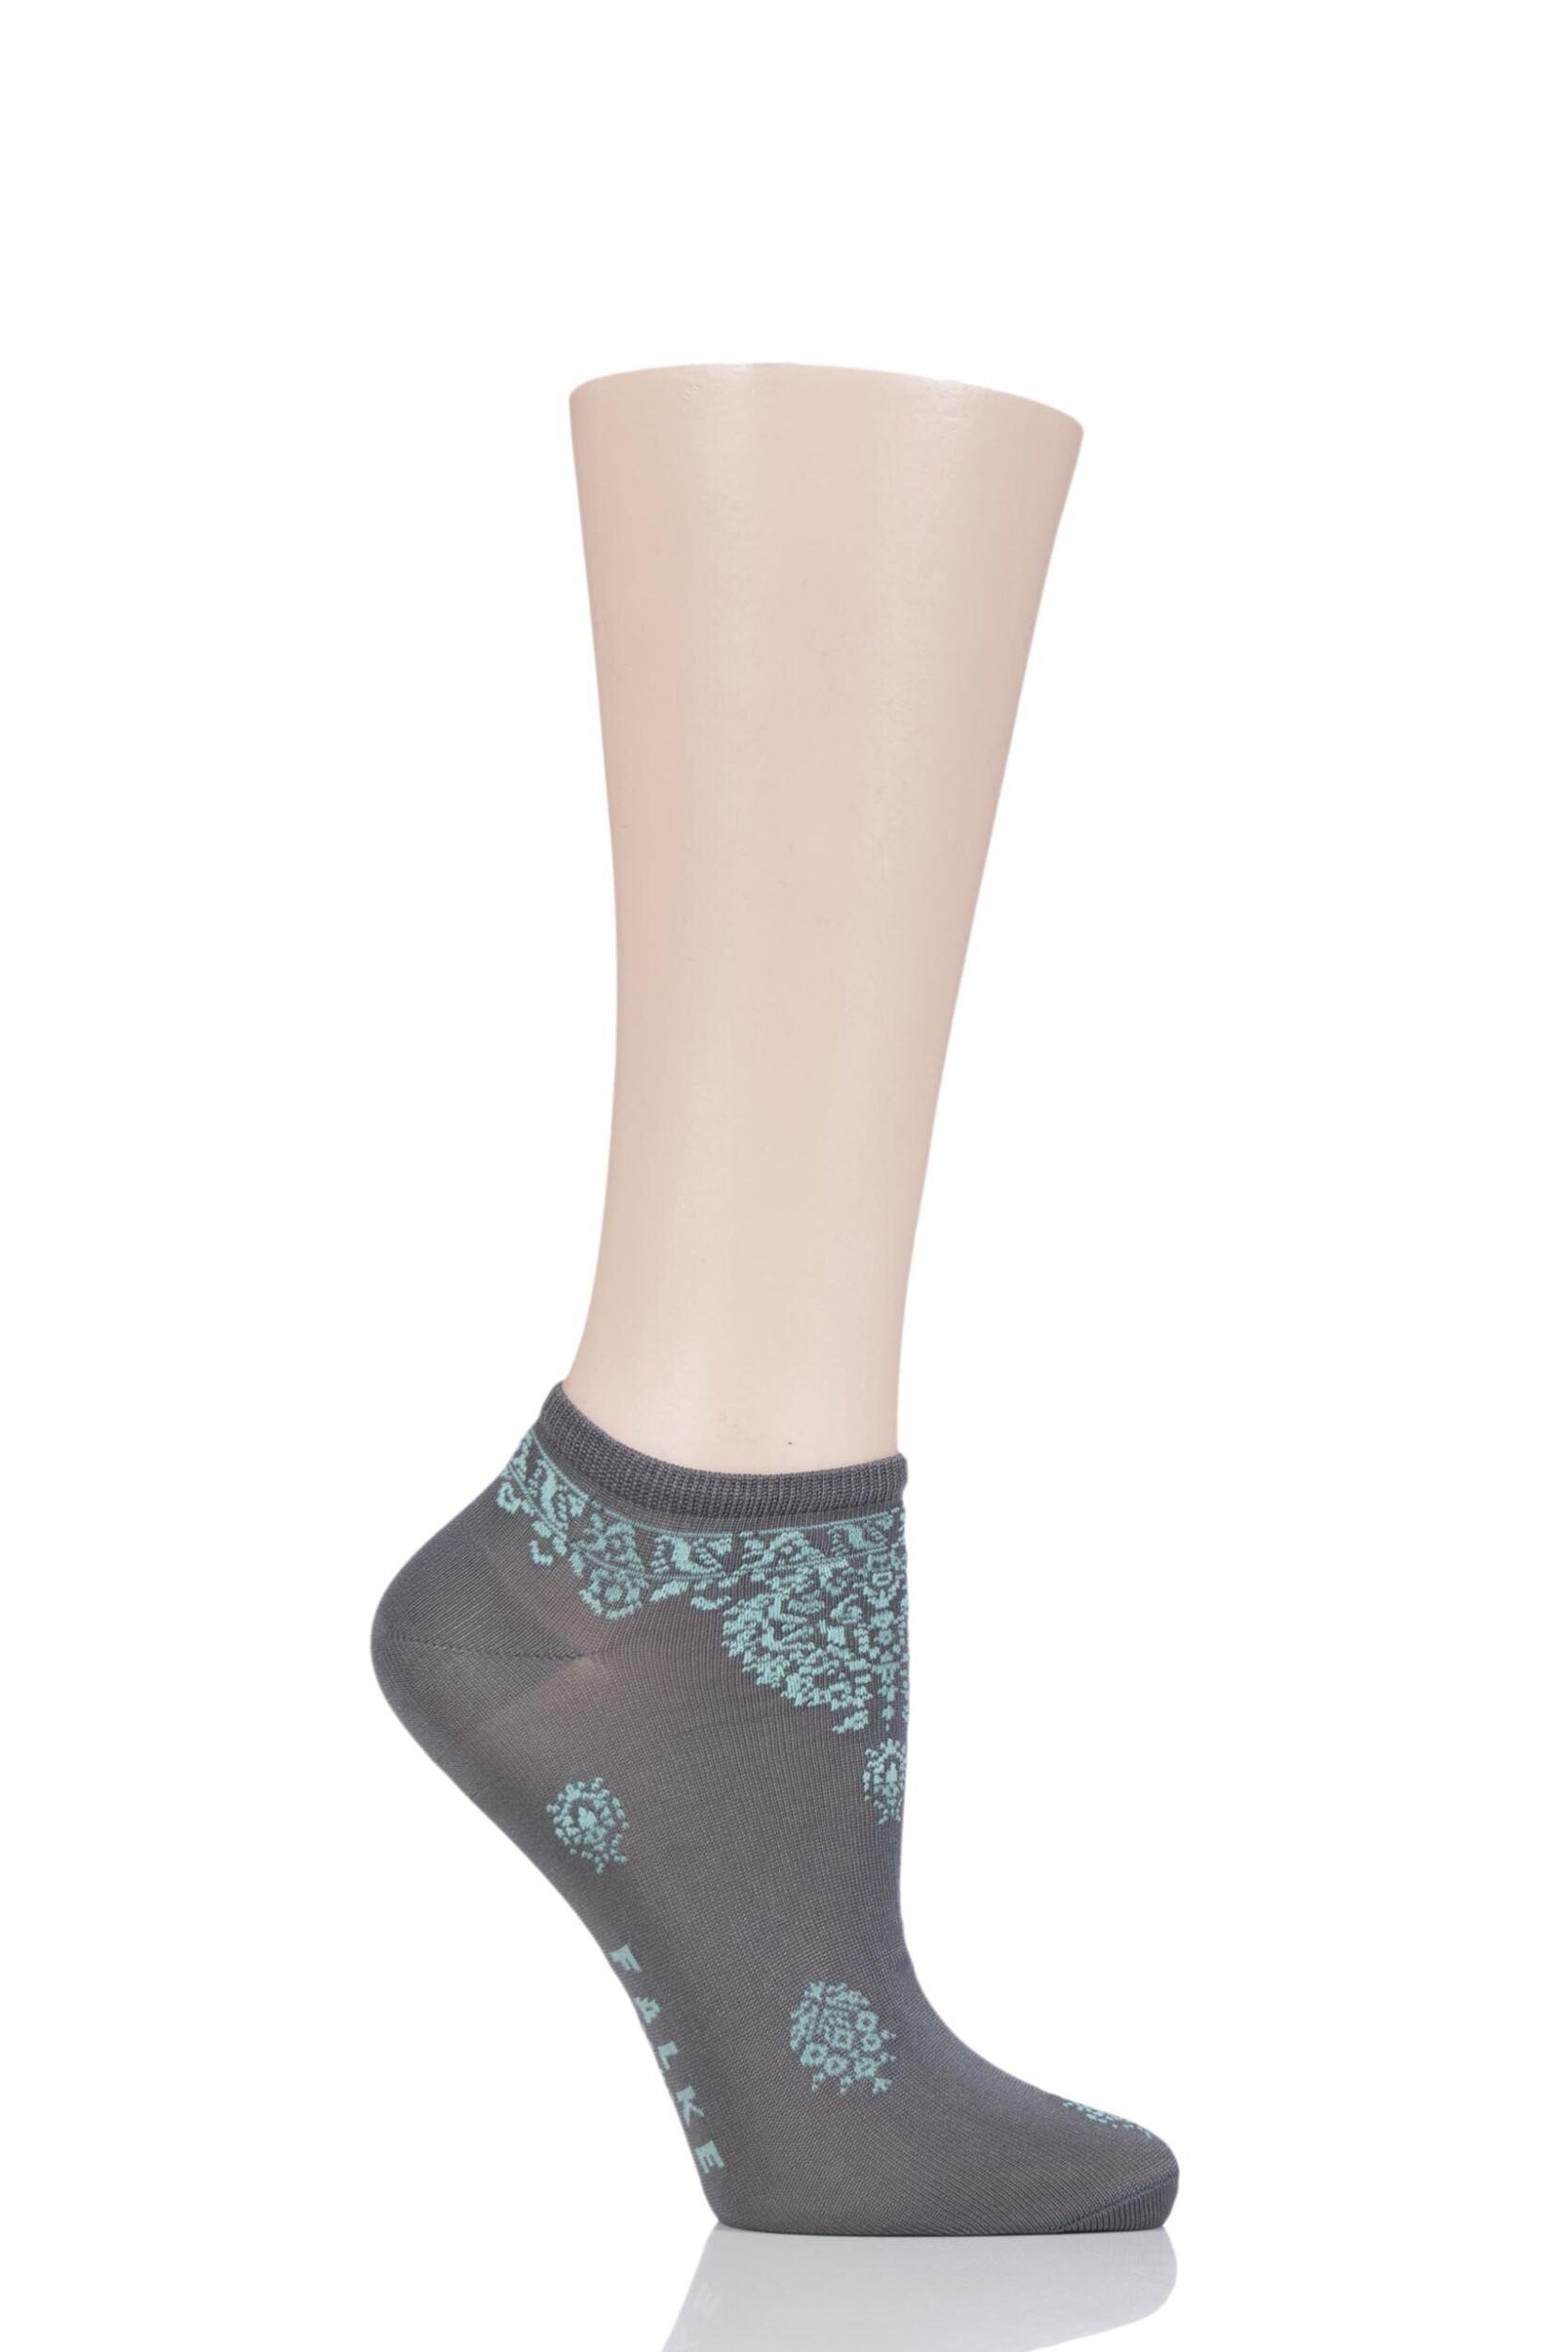 Womens Miniature Ankle Socks Falke Buy Cheap 2018 New Clearance Outlet 4B9Zu1rh